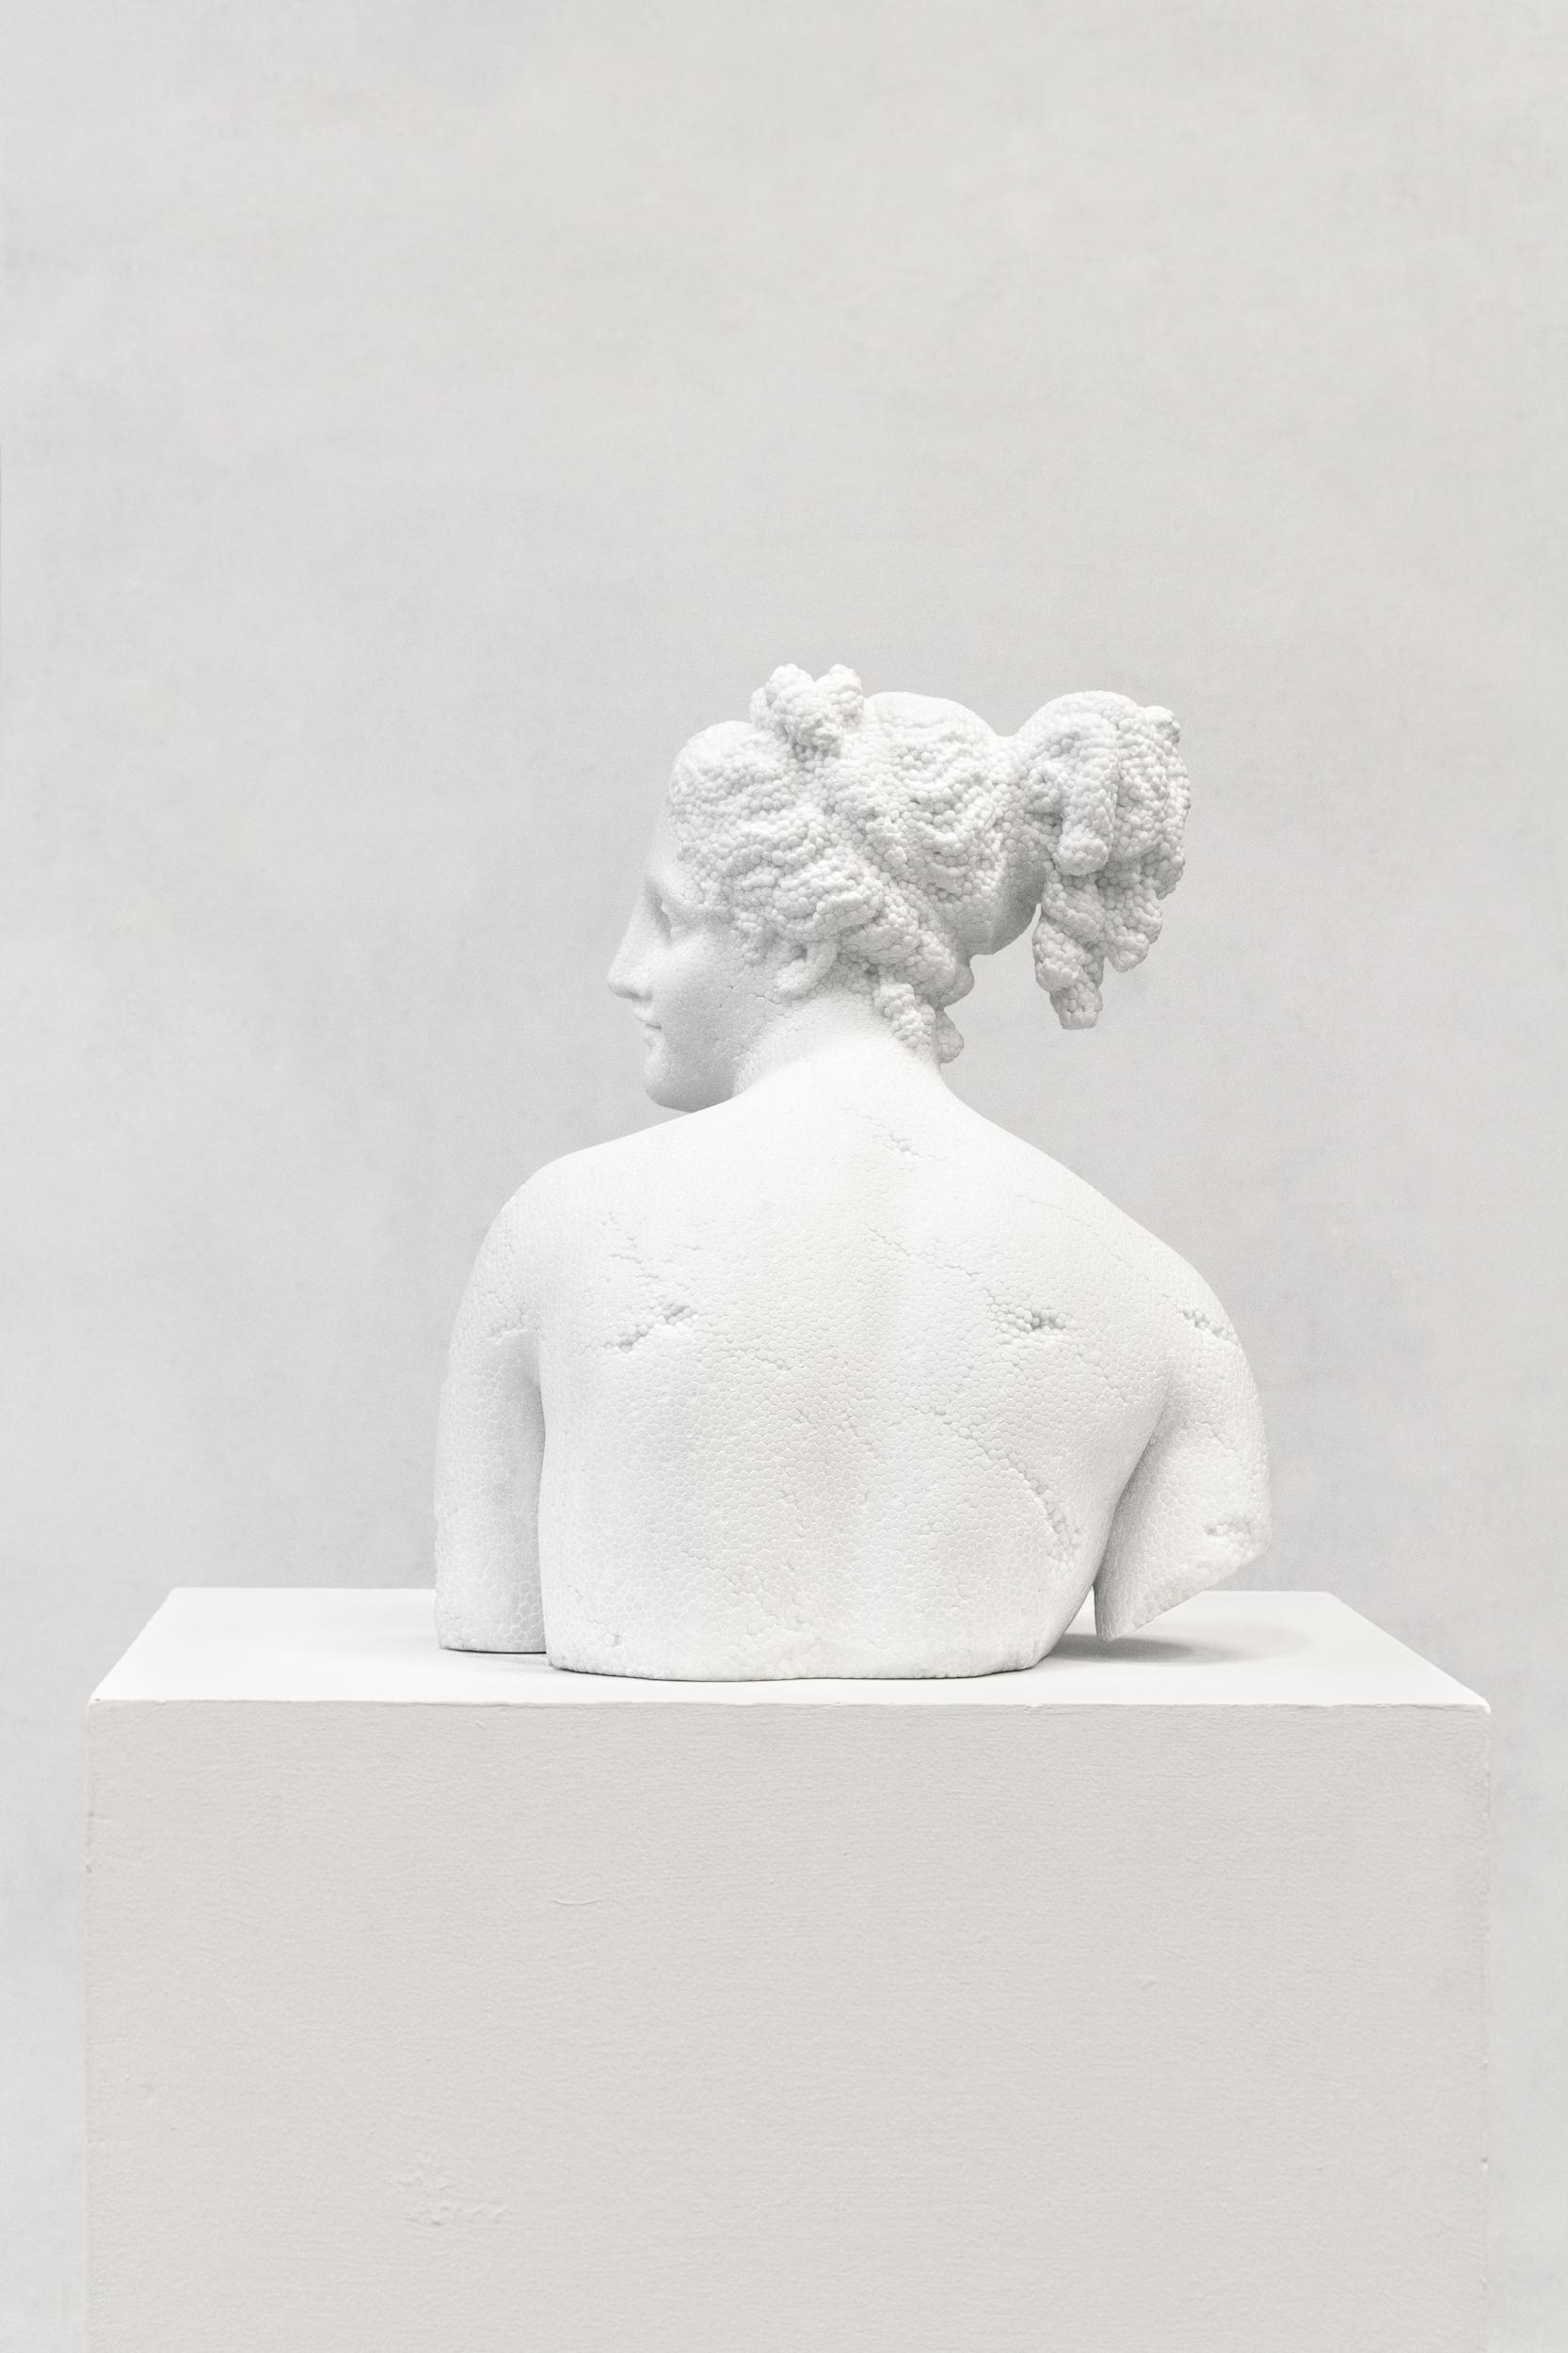 venere-italica-2016-marmo-bianco-cm-53-x-41-x-45-8656